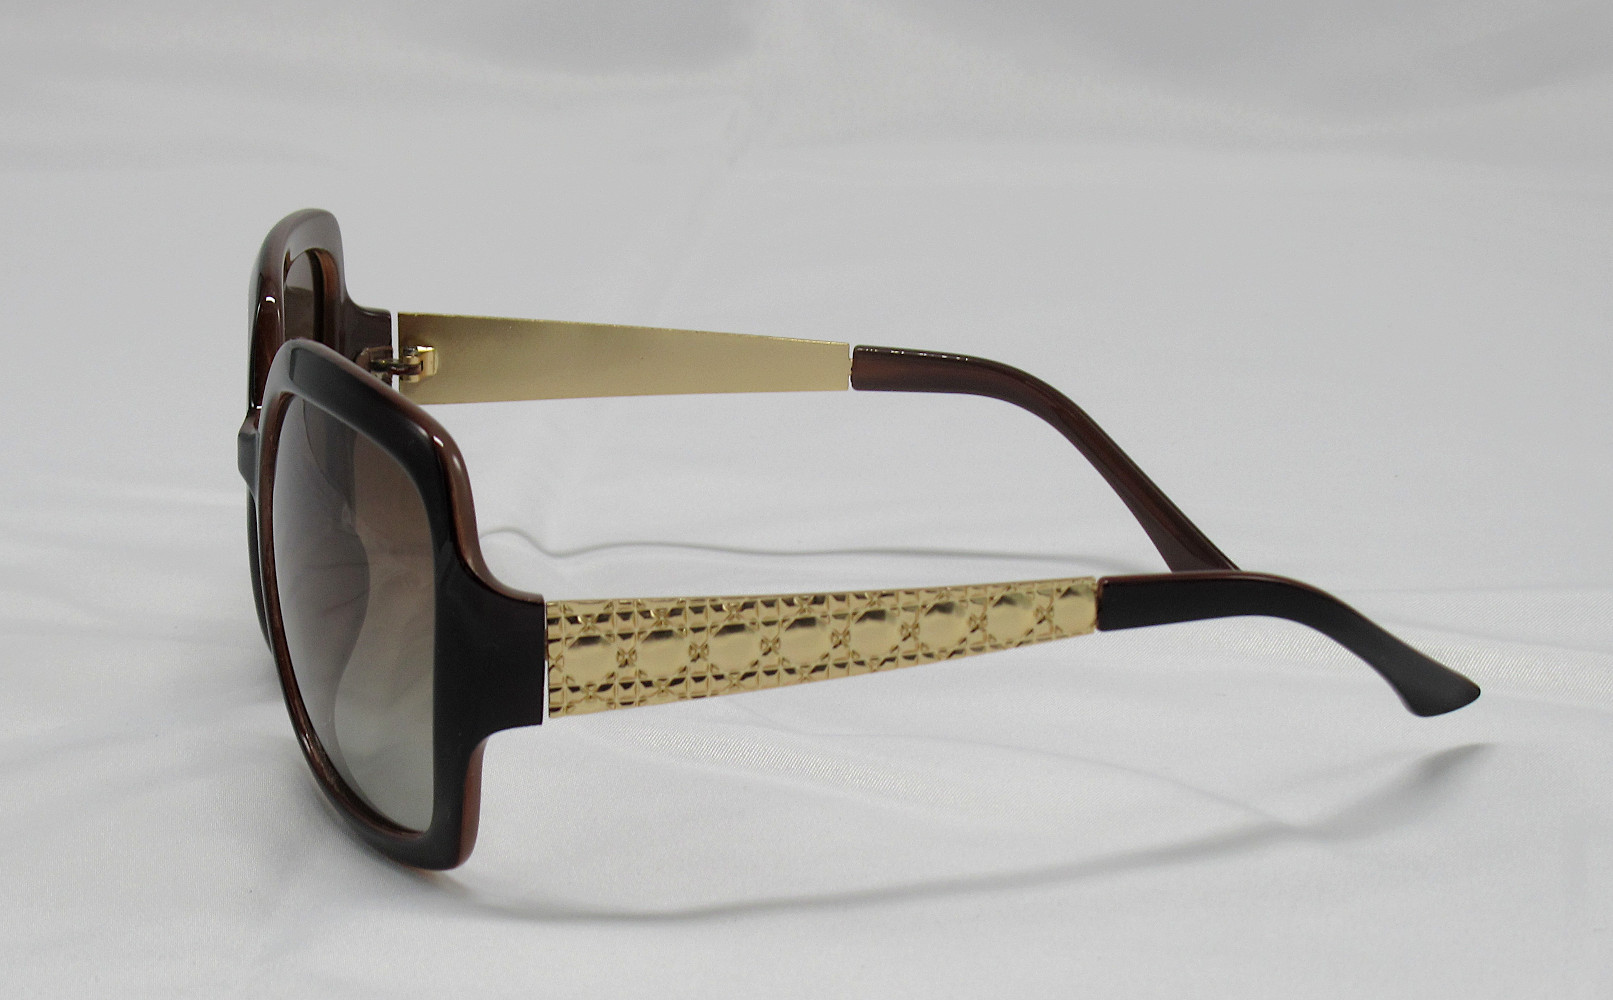 RJ-114_Polarized Sunglasses_brown-gold-P2232-3